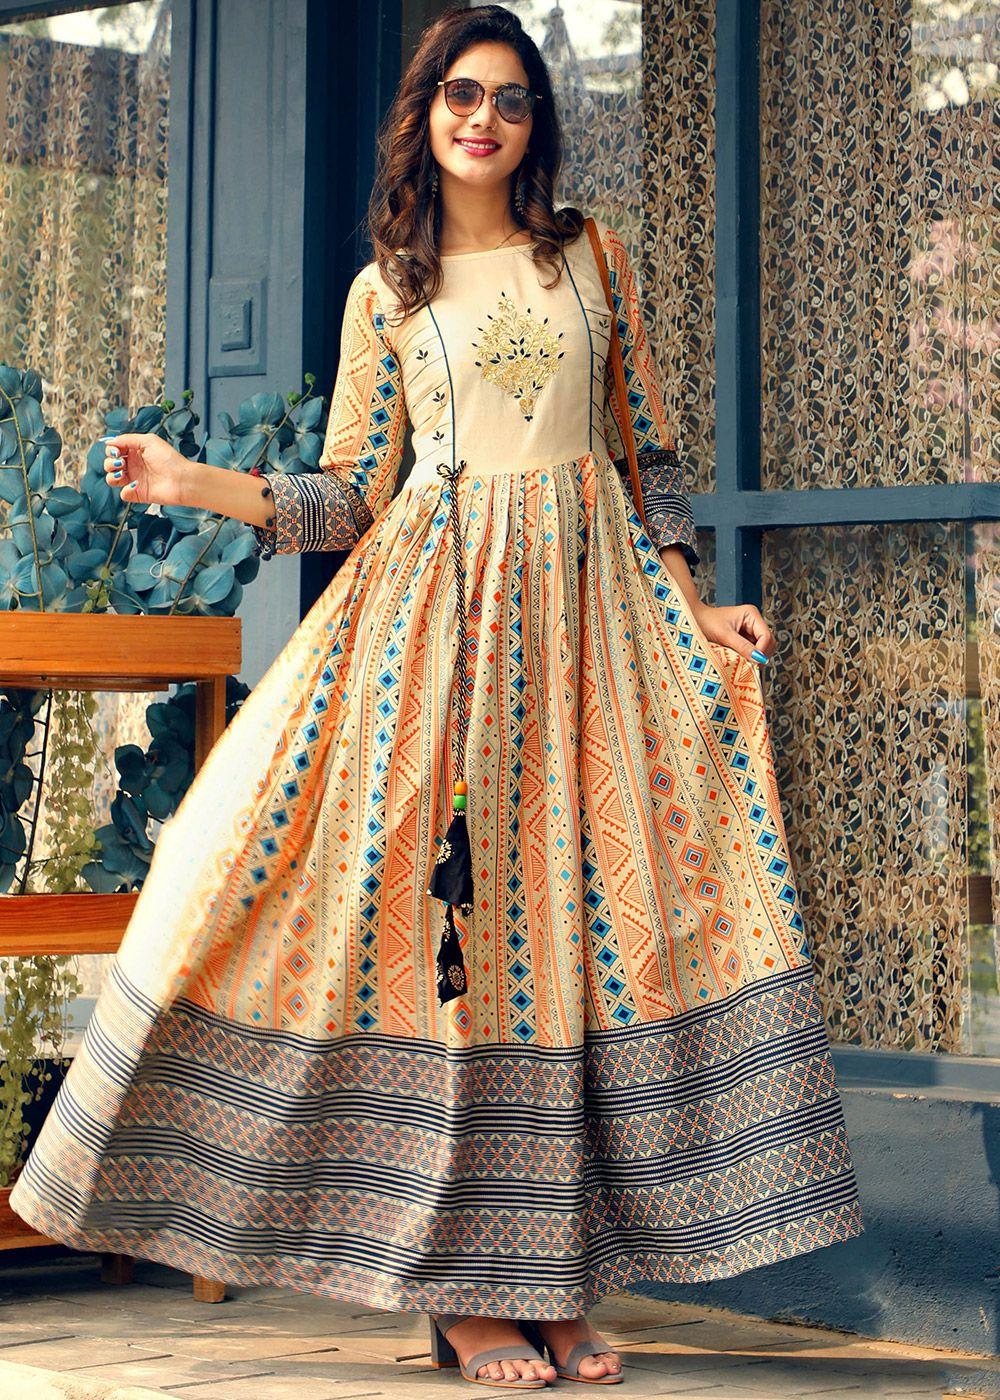 Fabric Reyon  Gota work on kurti with print jacket Women Indian Ethnic Kurta Kurti Flared Anarkali Kurta Blue Partywear Gown Dress